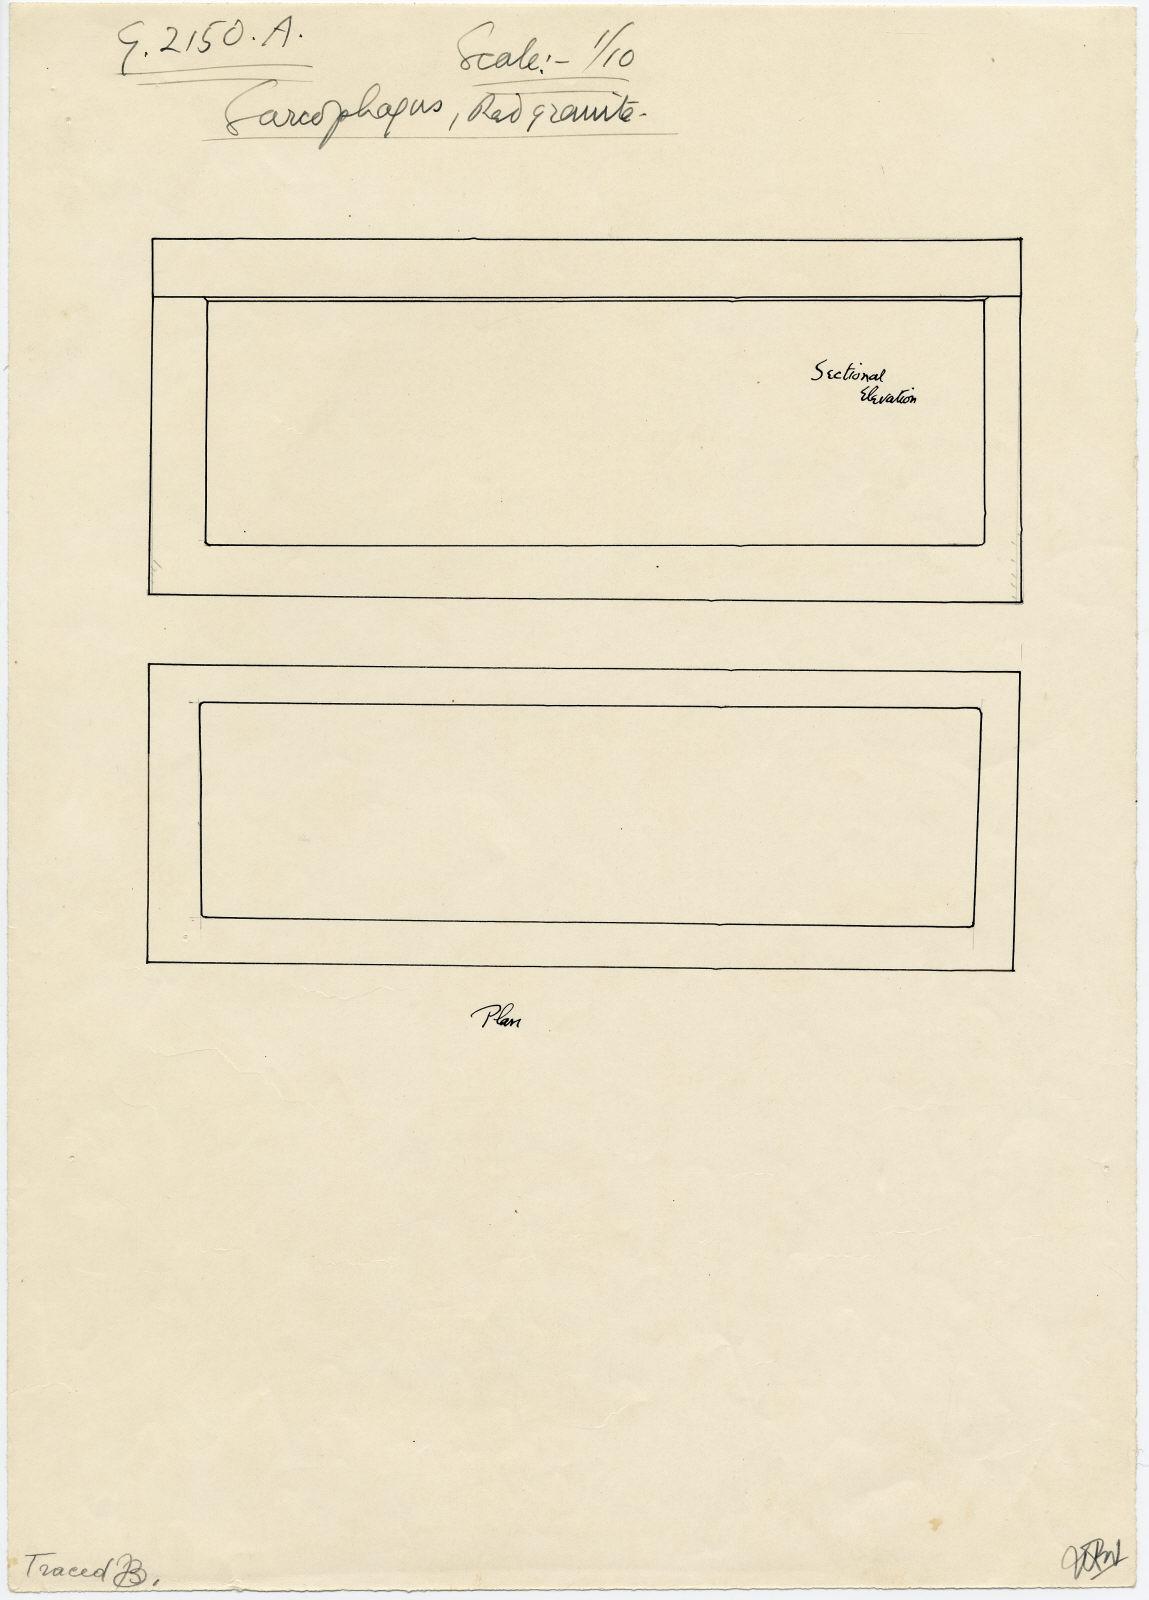 Drawings: G 2150, Shaft A: sarcophagus